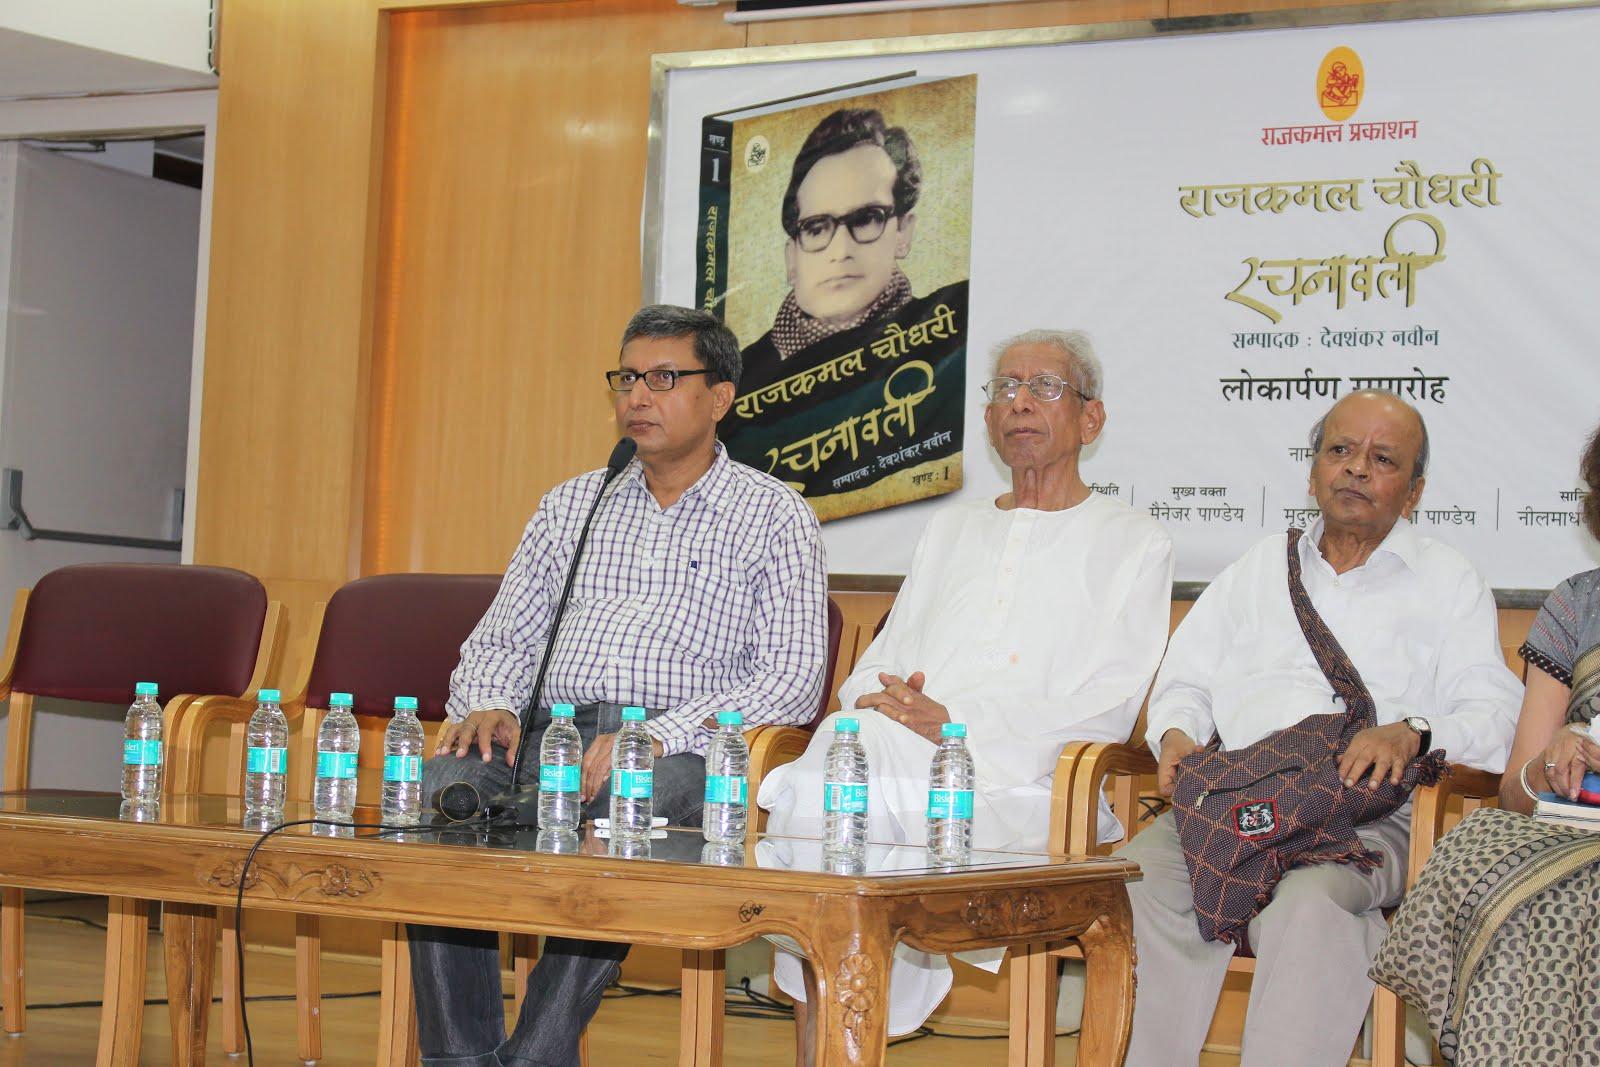 book release (RAJKAMAL CHAUDHARY RACHNAWALI)